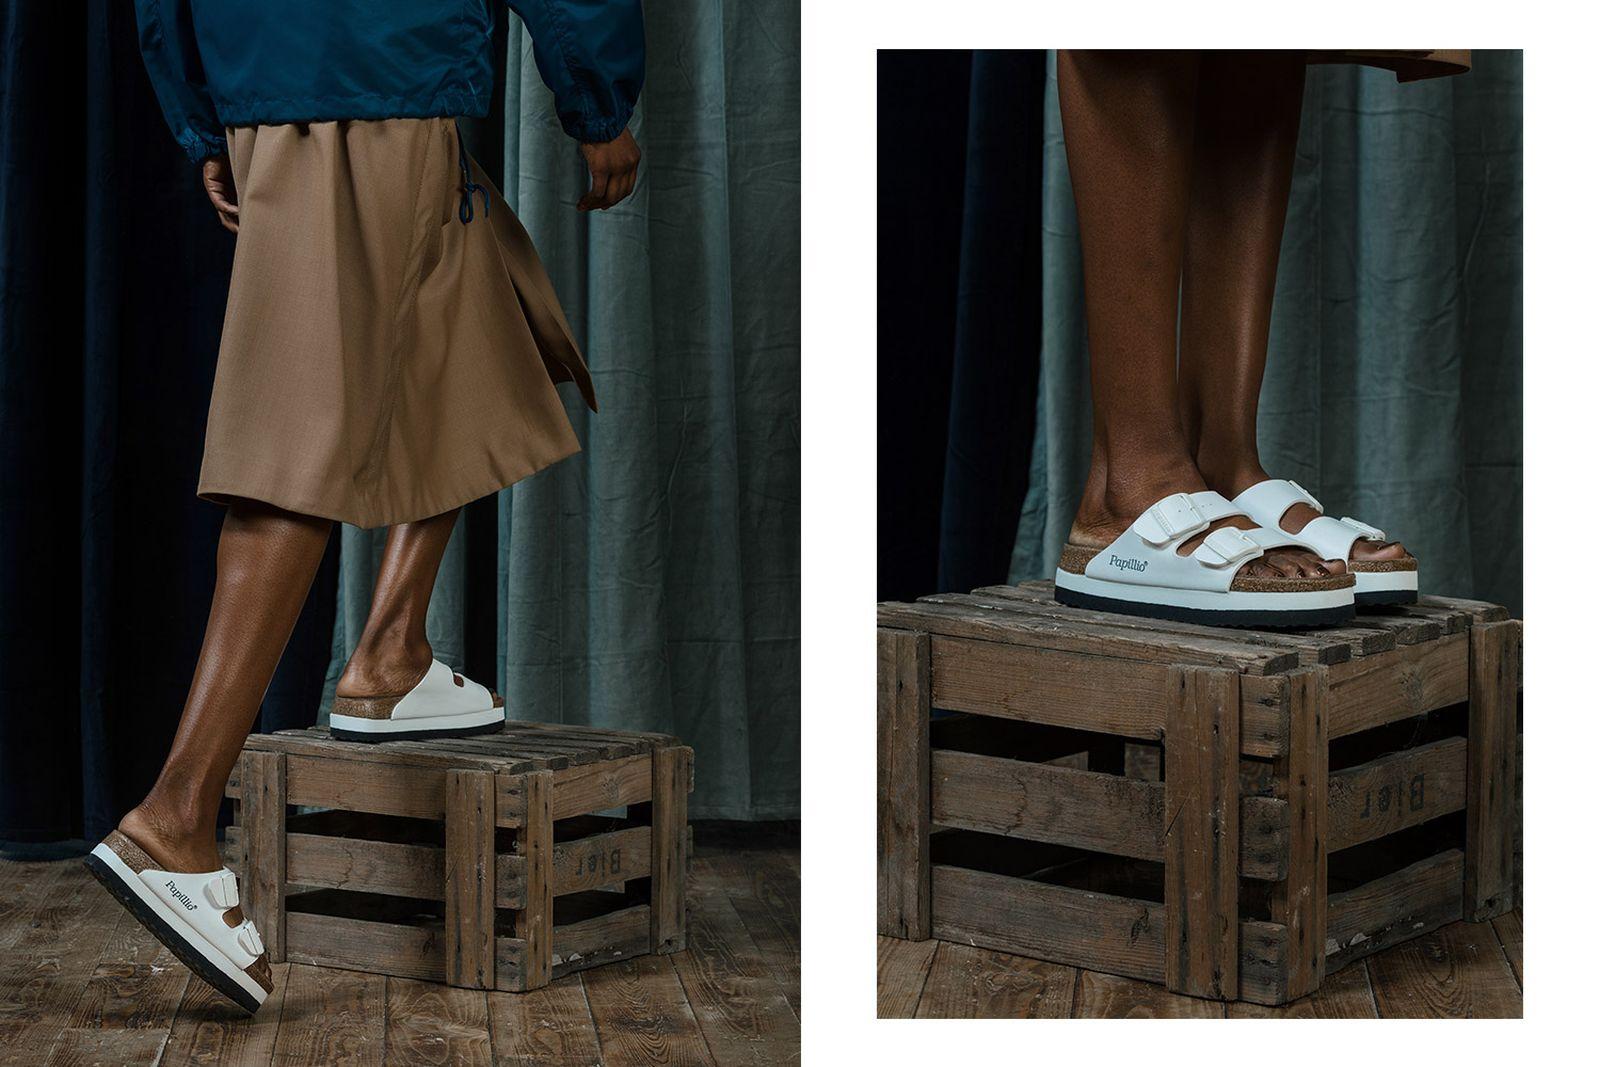 birkenstock-sandals-history-design-fashion-02